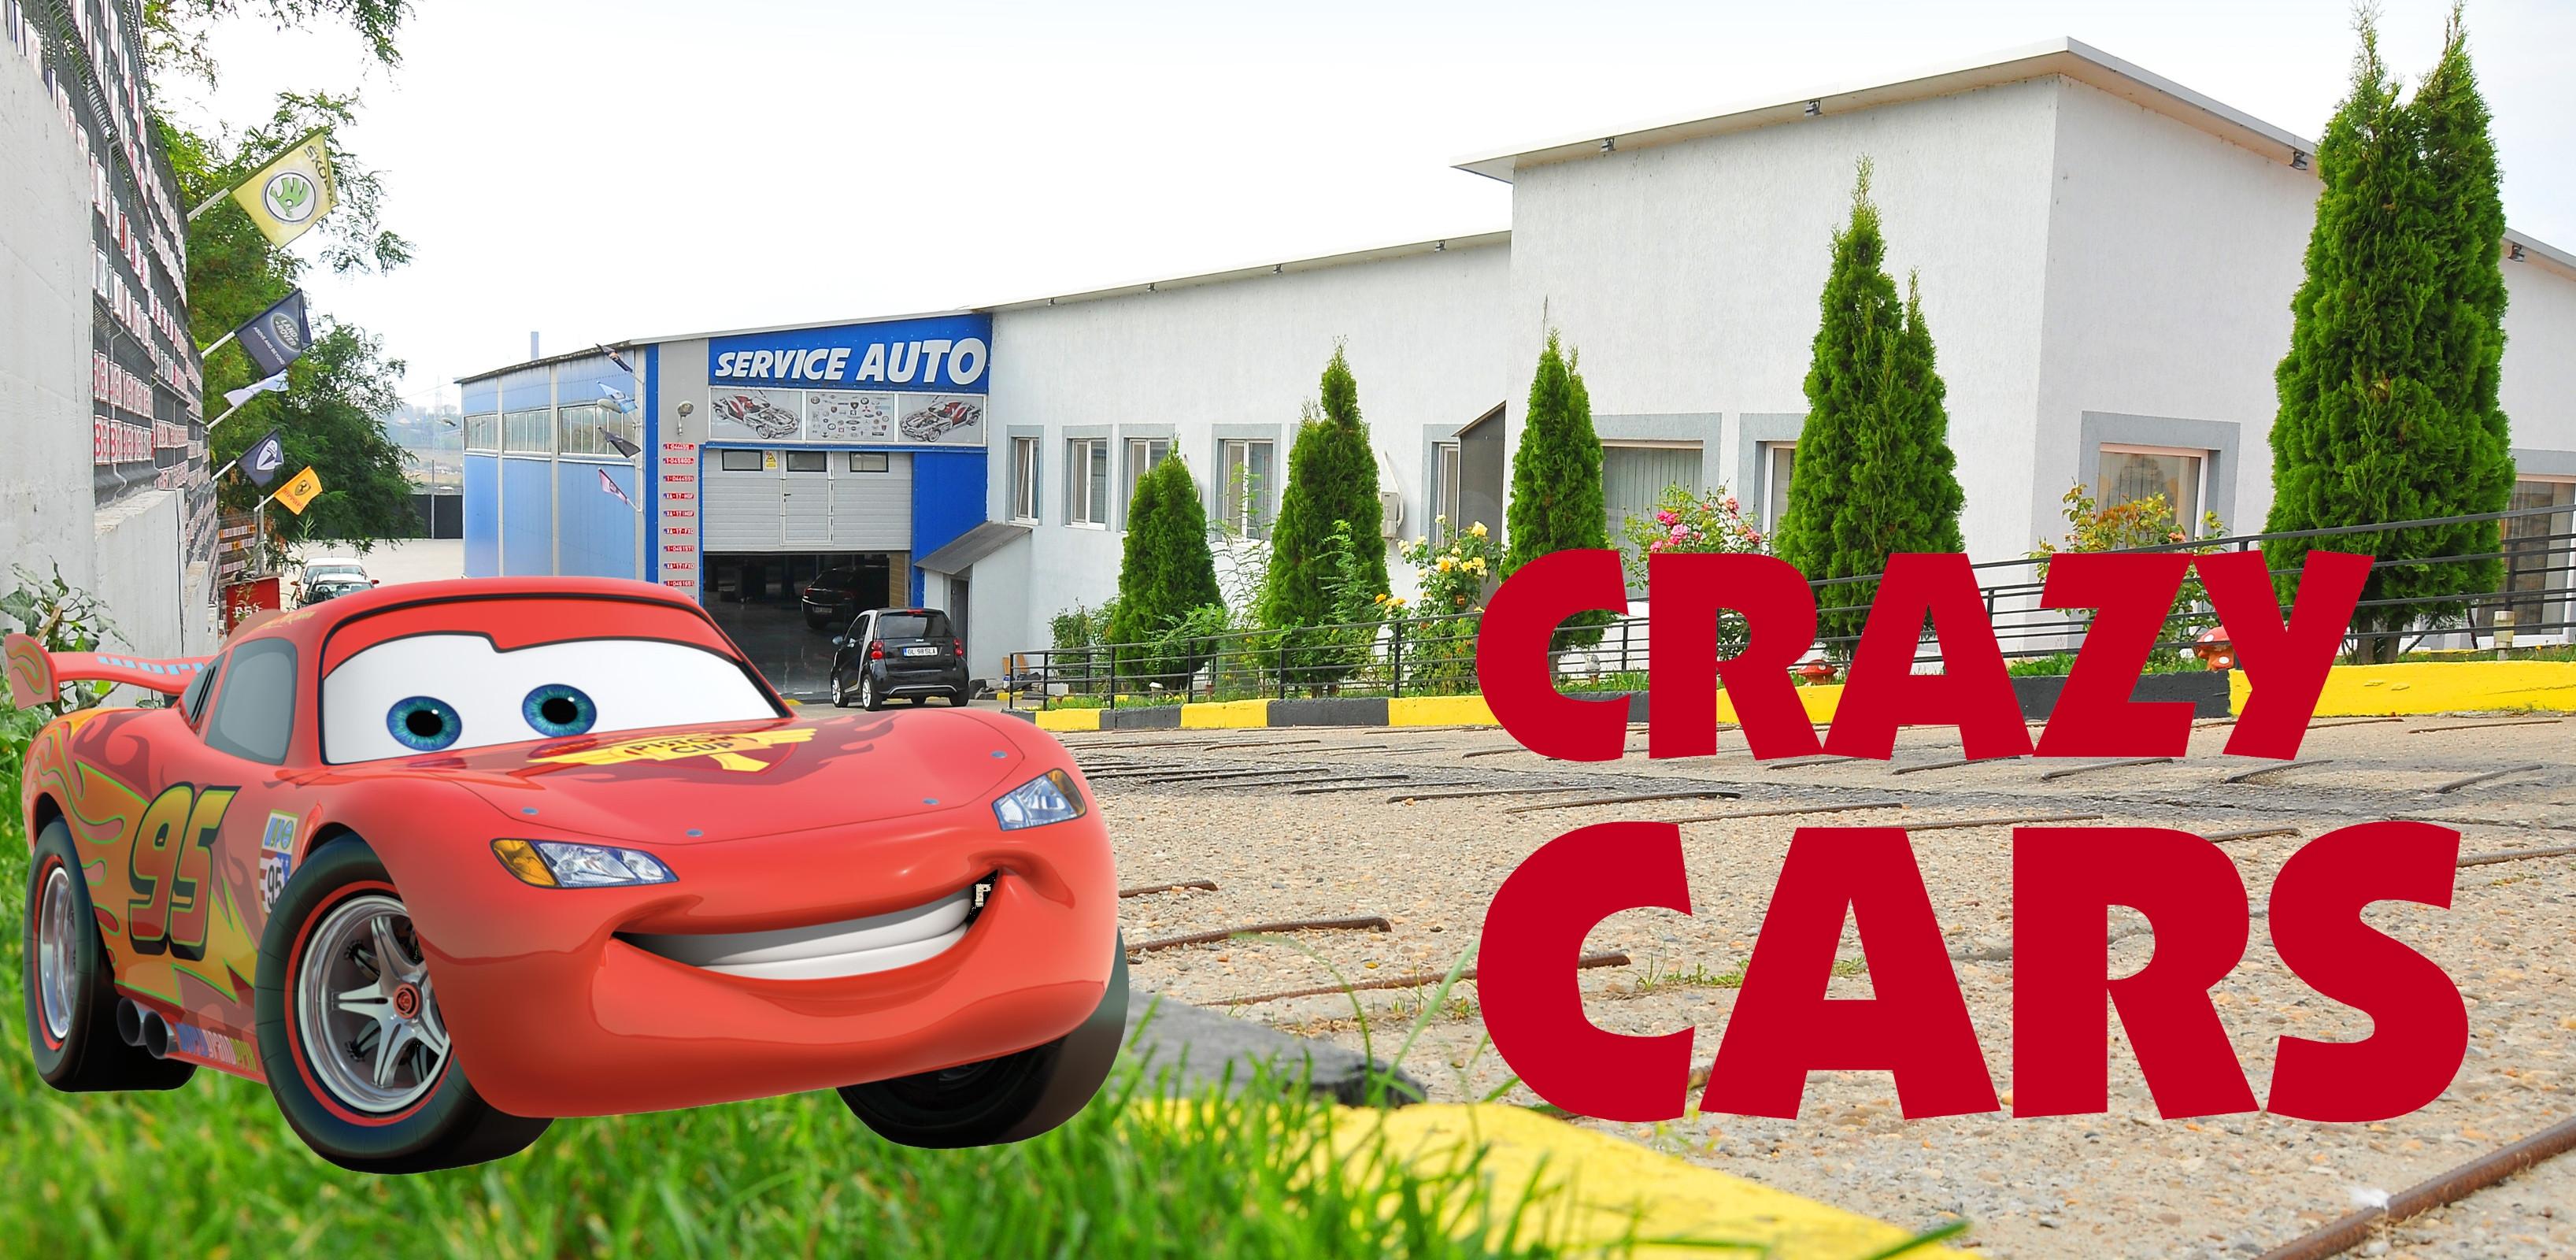 coperta_crazy-cars_2